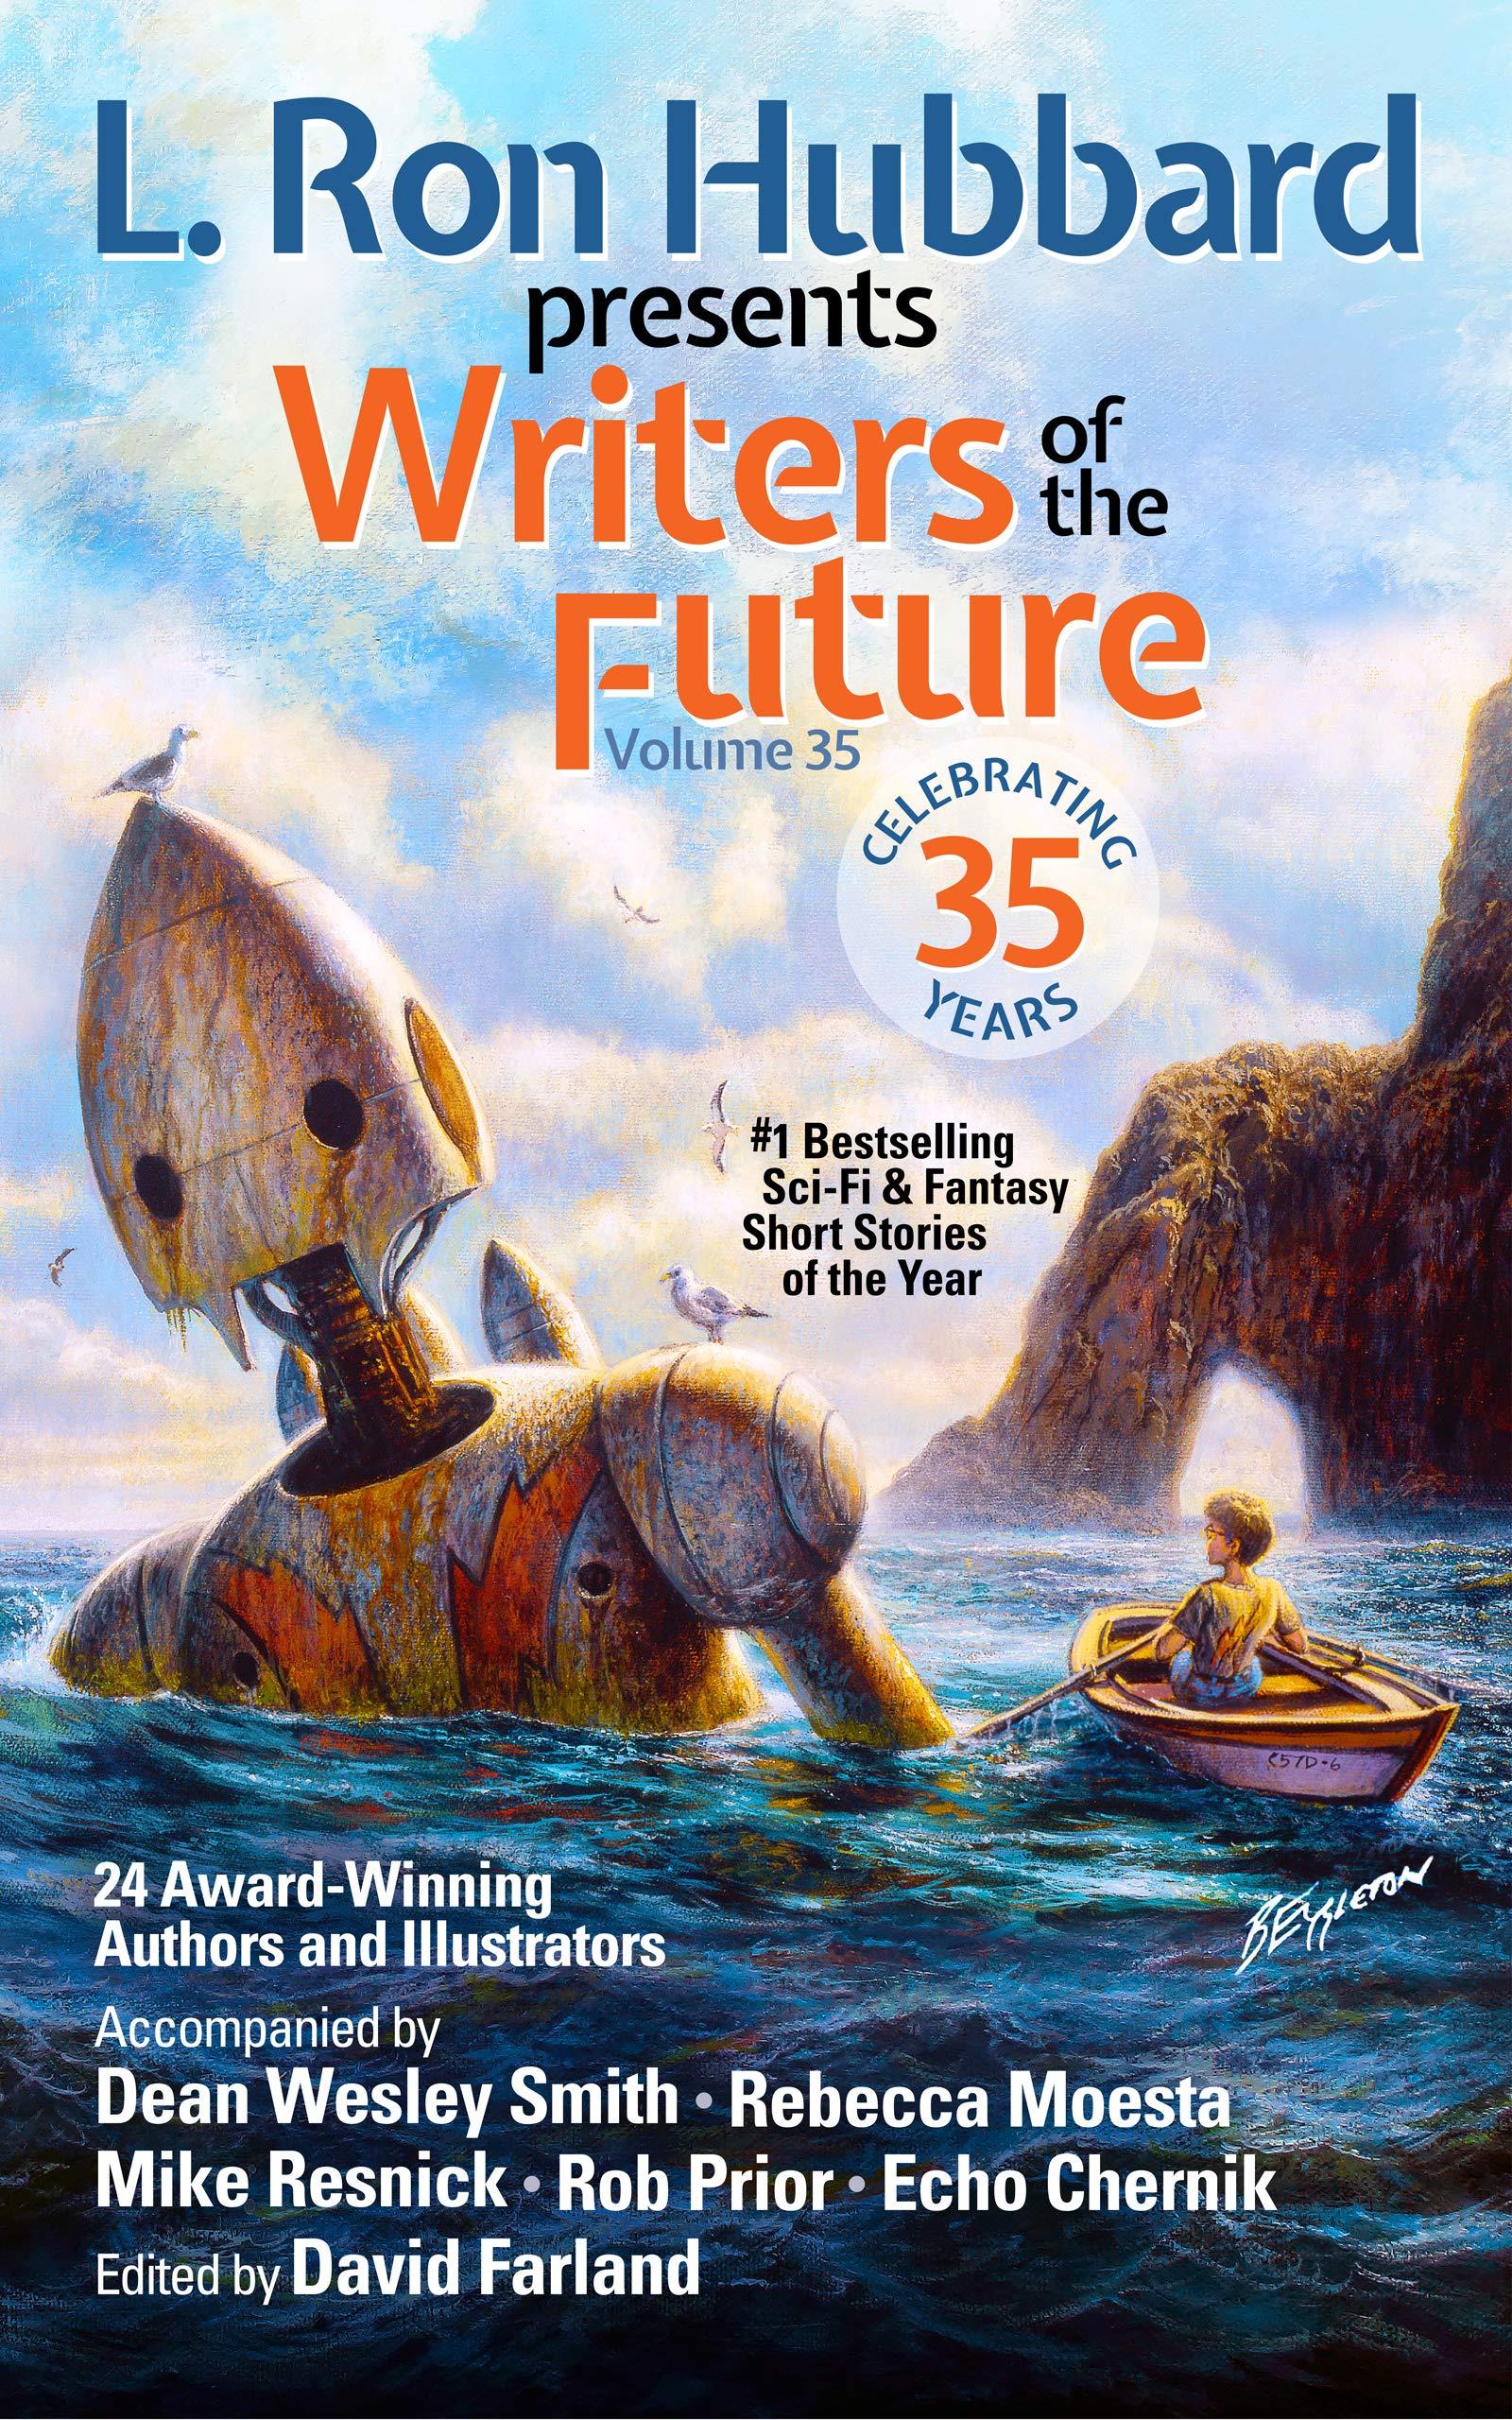 L. Ron Hubbard Presents Writers of the Future Volume 35 ...